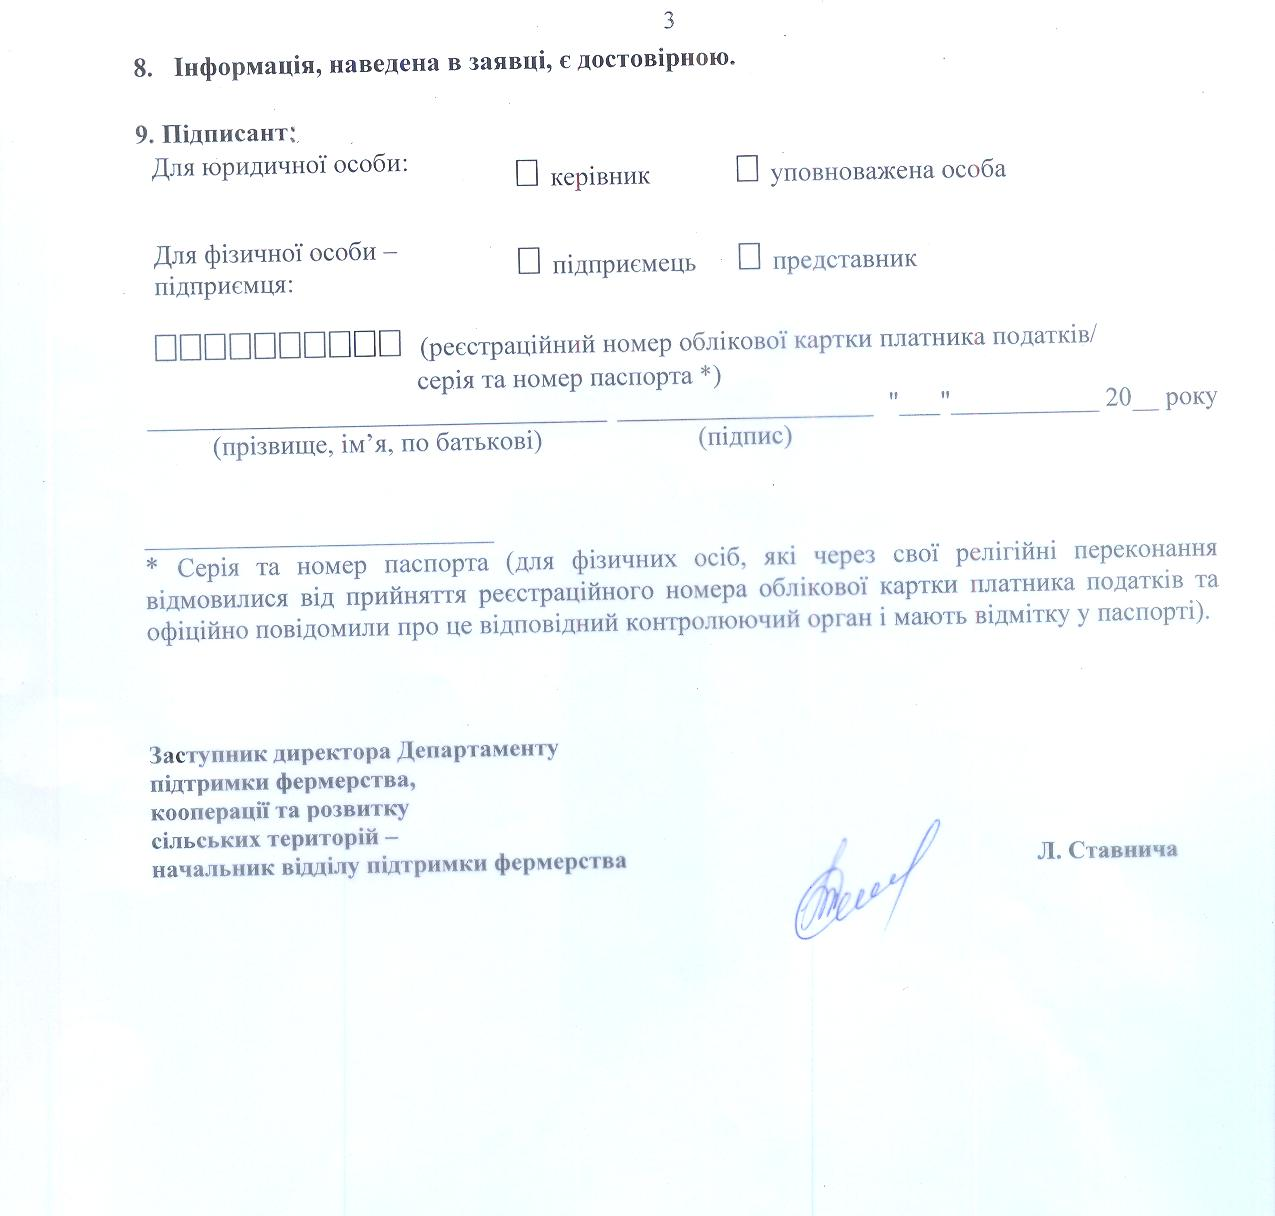 Наказ № 150 насіння заявка3